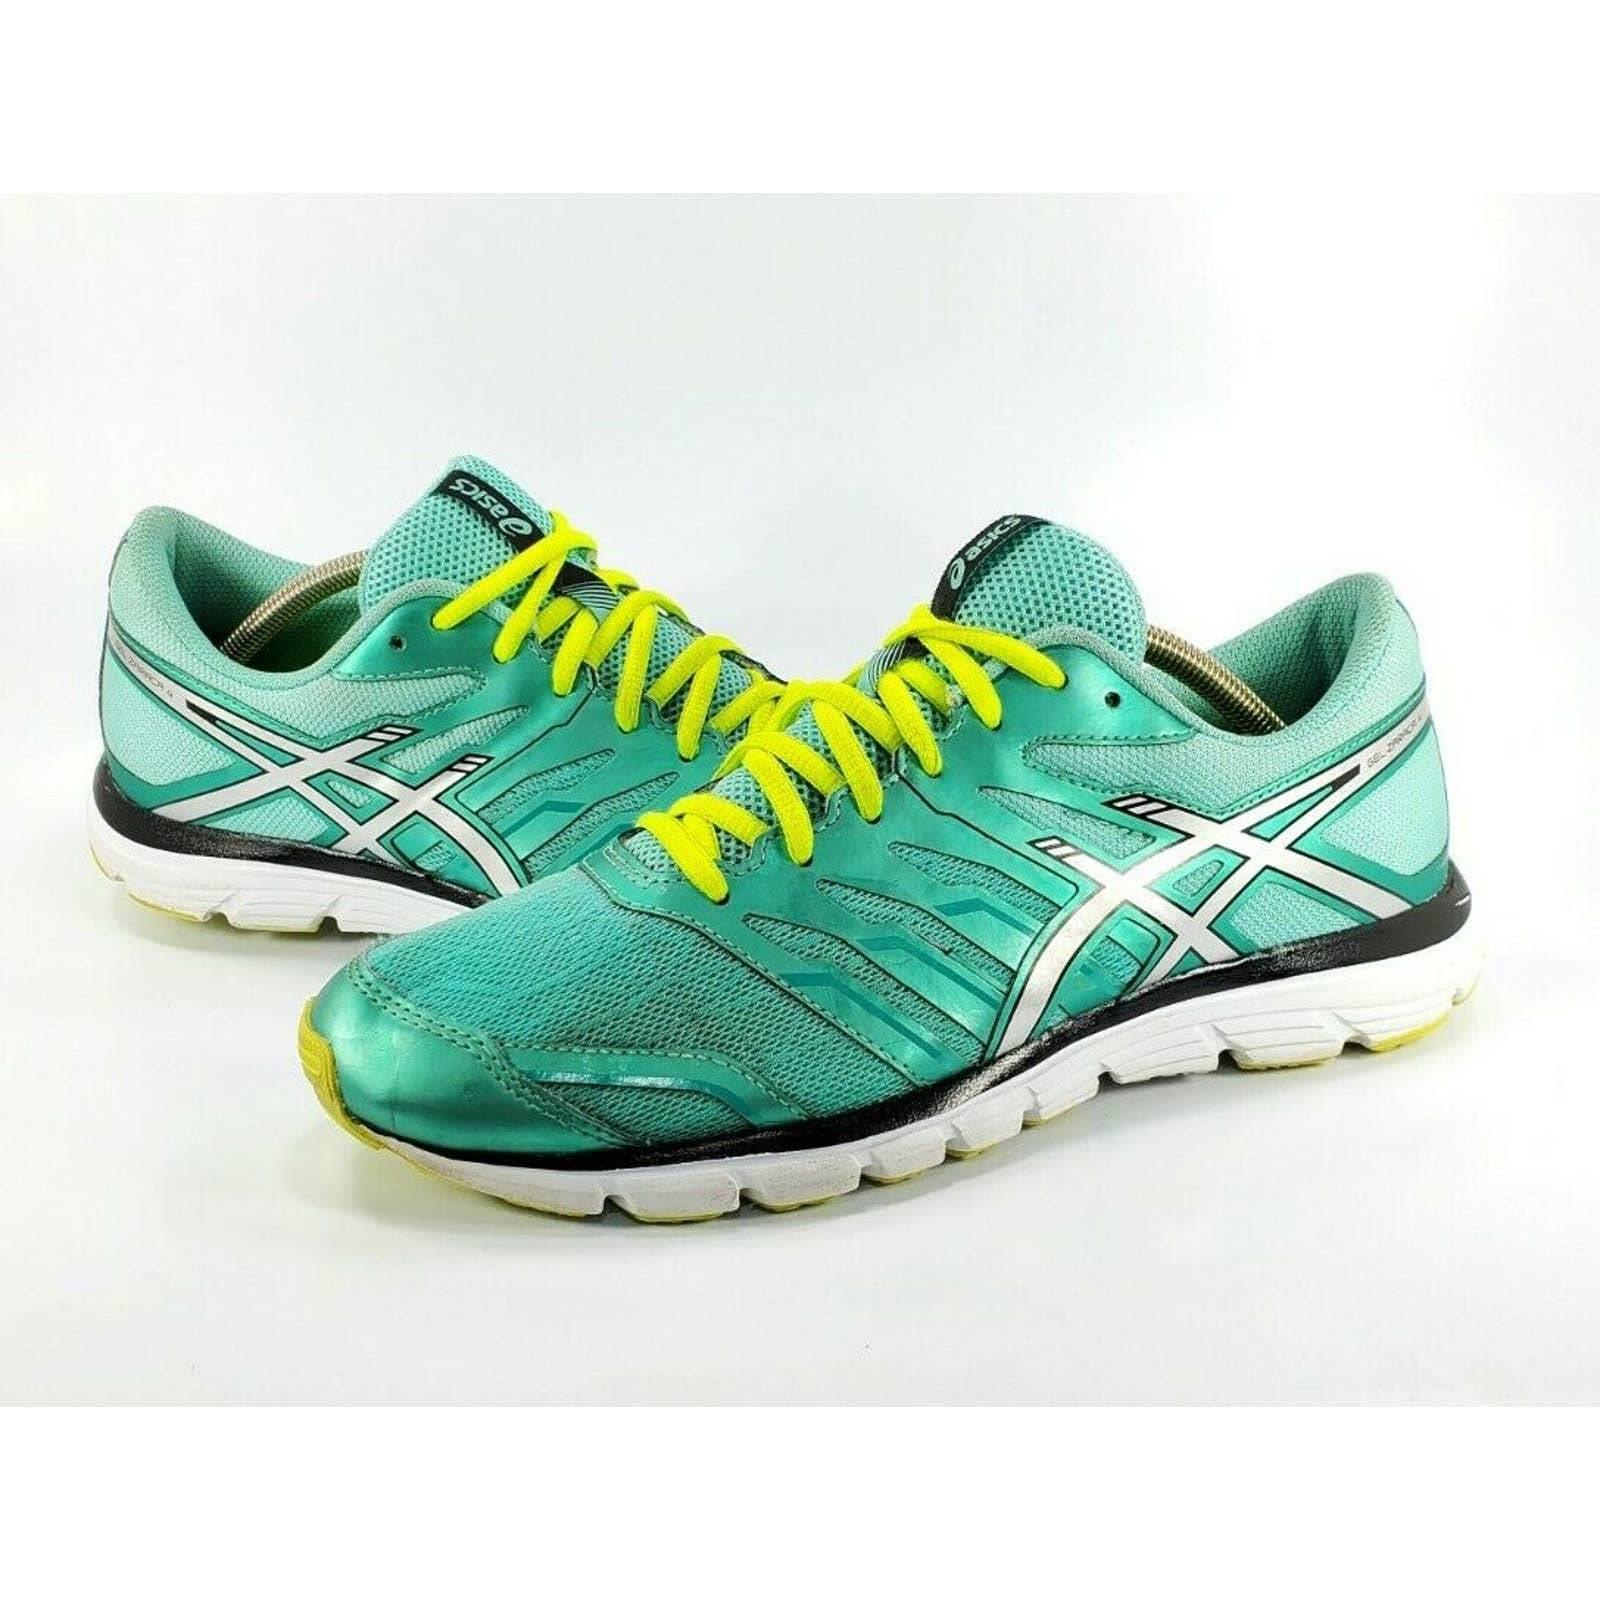 Asics Gel Zaraca 4 Running Athletic Shoe